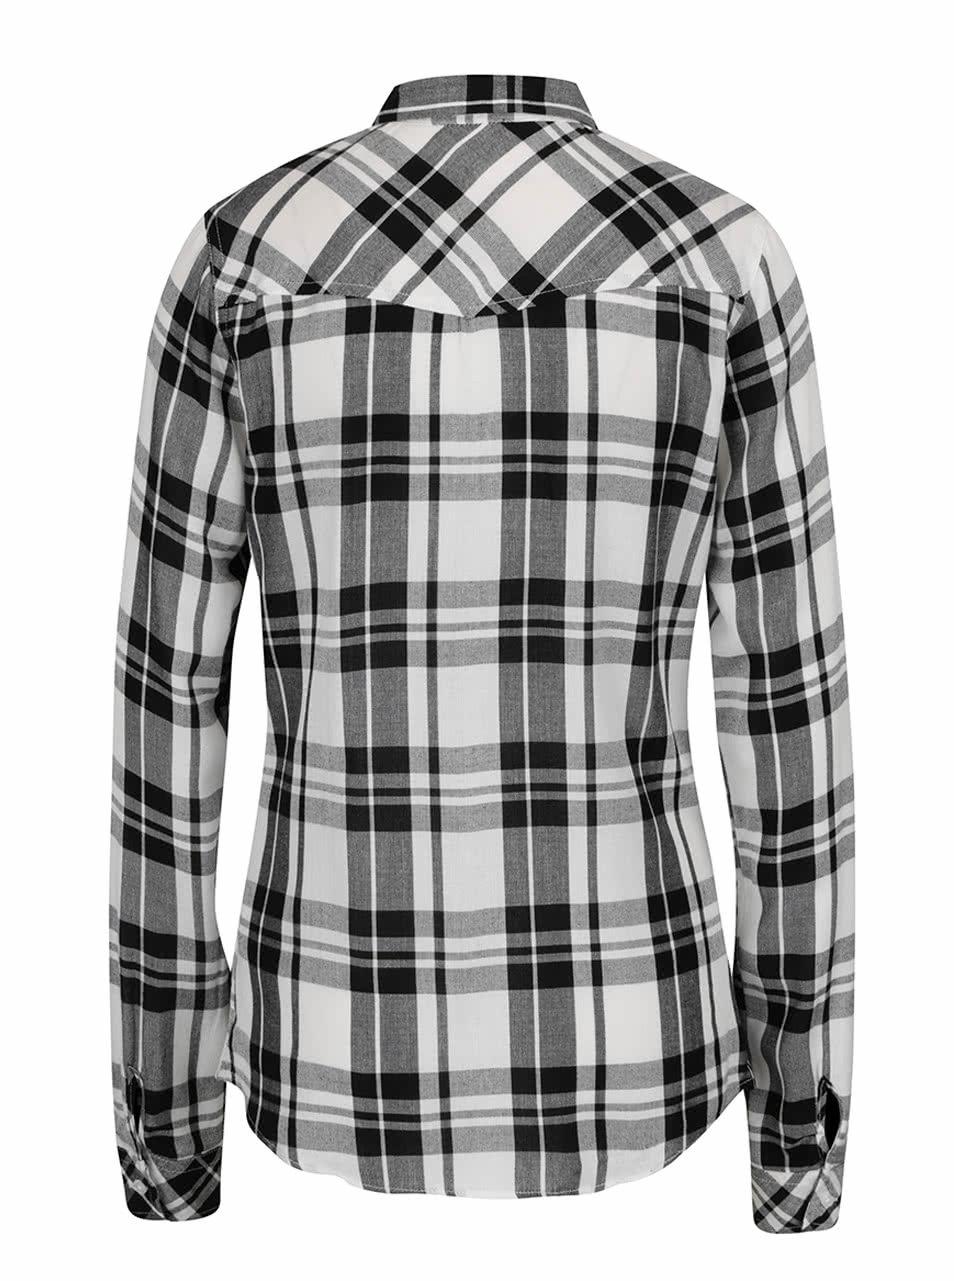 d632c49a7089 Čierno-biela károvaná košeľa s vreckami TALLY WEiJL ...